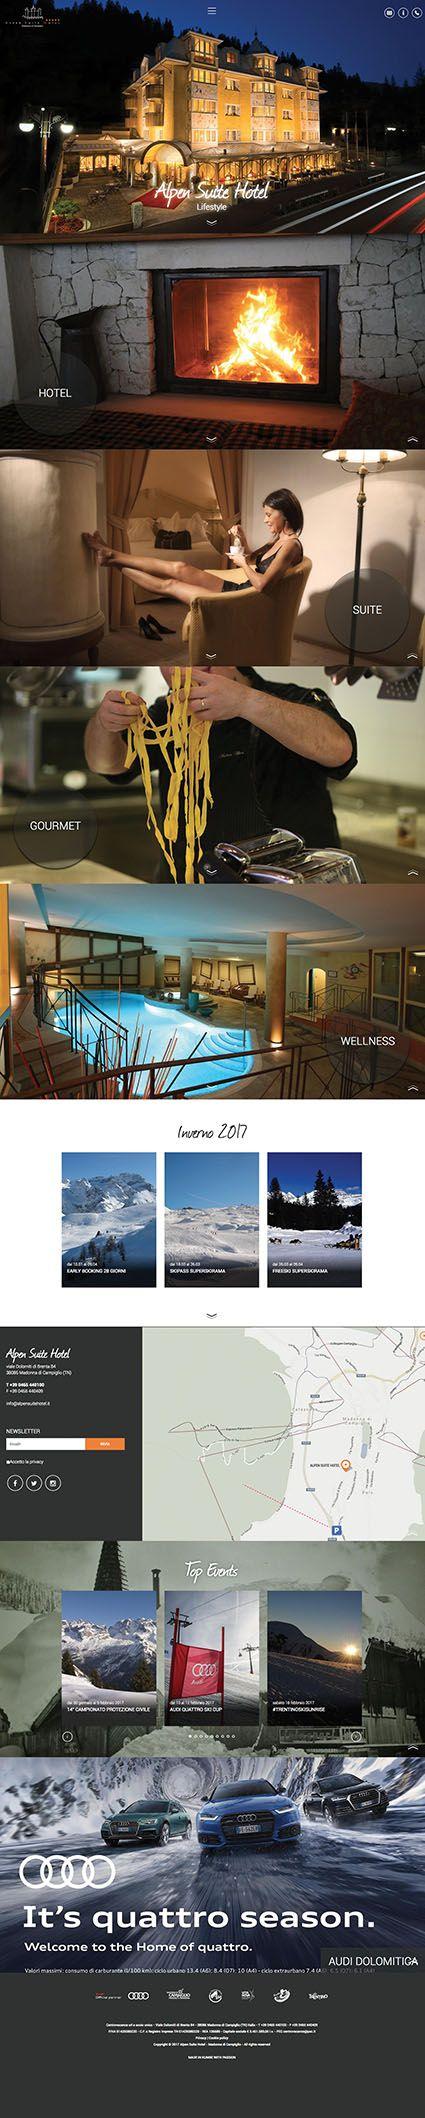 #alpensuitehotel www.alpensuitehotel.it #Kumbe #portfolioweb #webdesign #website #responsivedesign #responsive #suite #gourmet #hotel #wellness #lifestyle #winter #inverno #summer #estate #snow #ski #skiarea #valrendena #snowboard #madonnadicampiglio #mdc #trentino #dolomitidibrenta #dolomiti #trekking #love #family #holiday